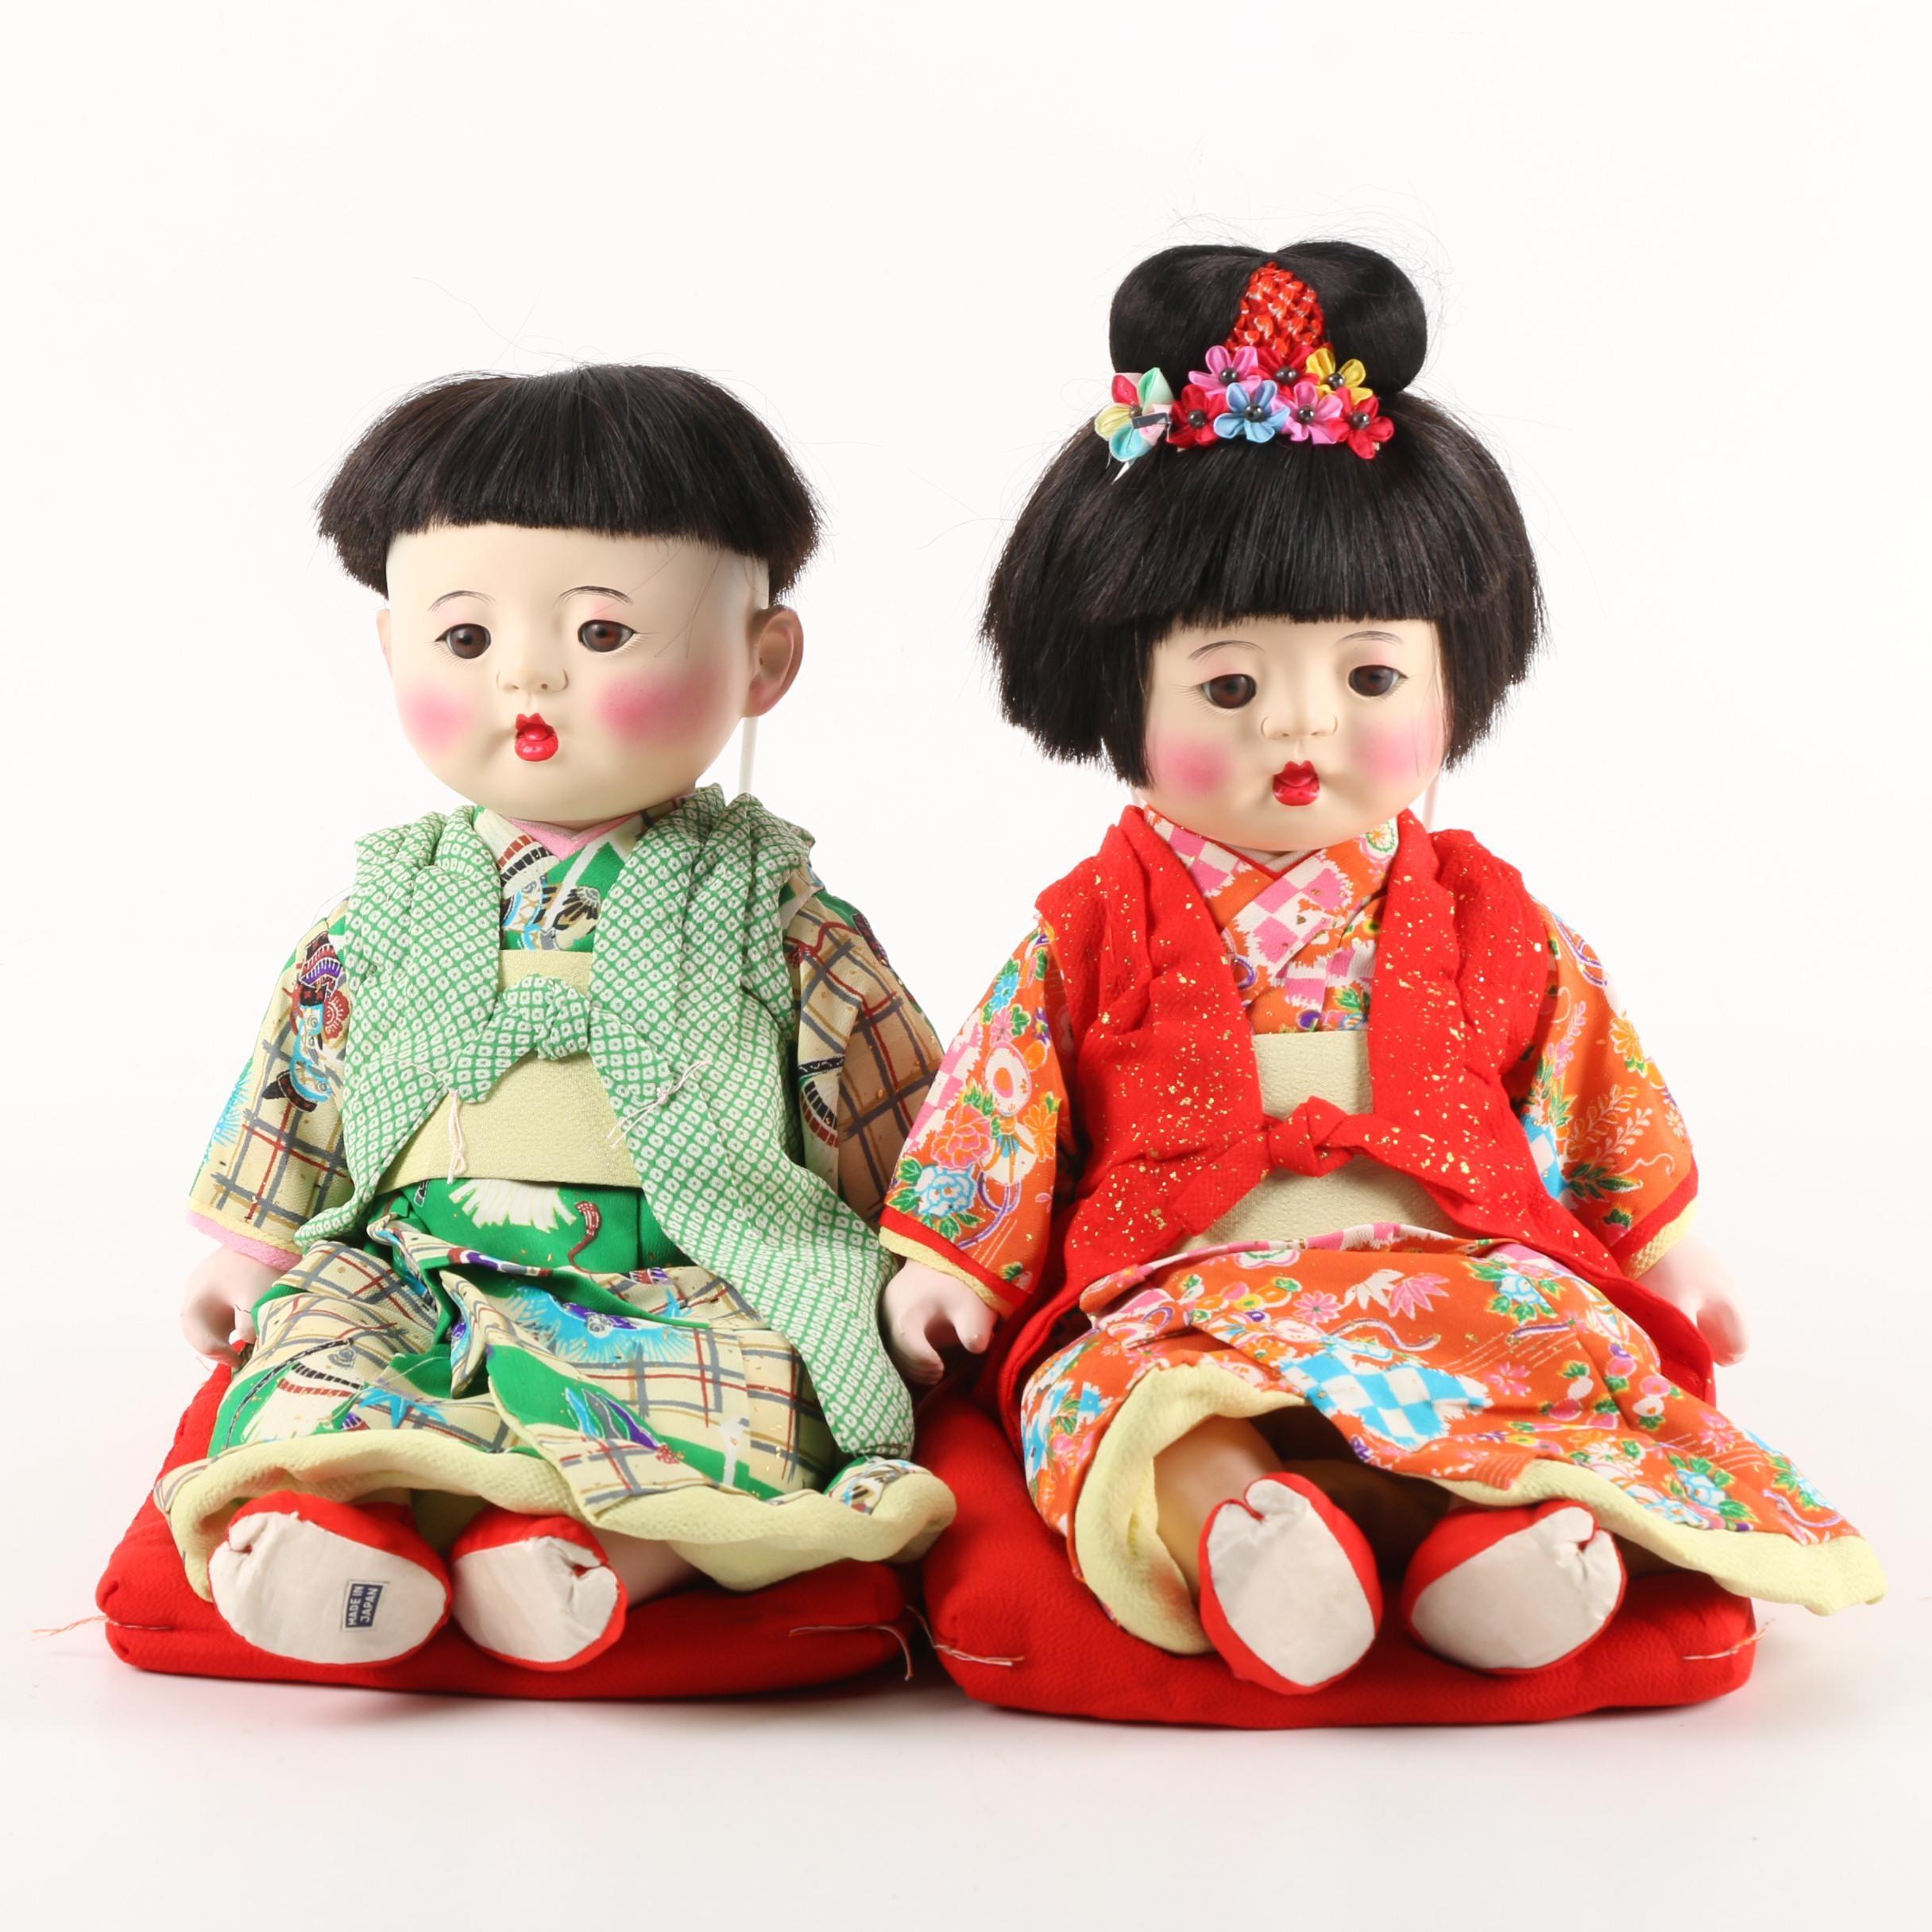 Vintage Japanese Porcelain Gofun Dolls